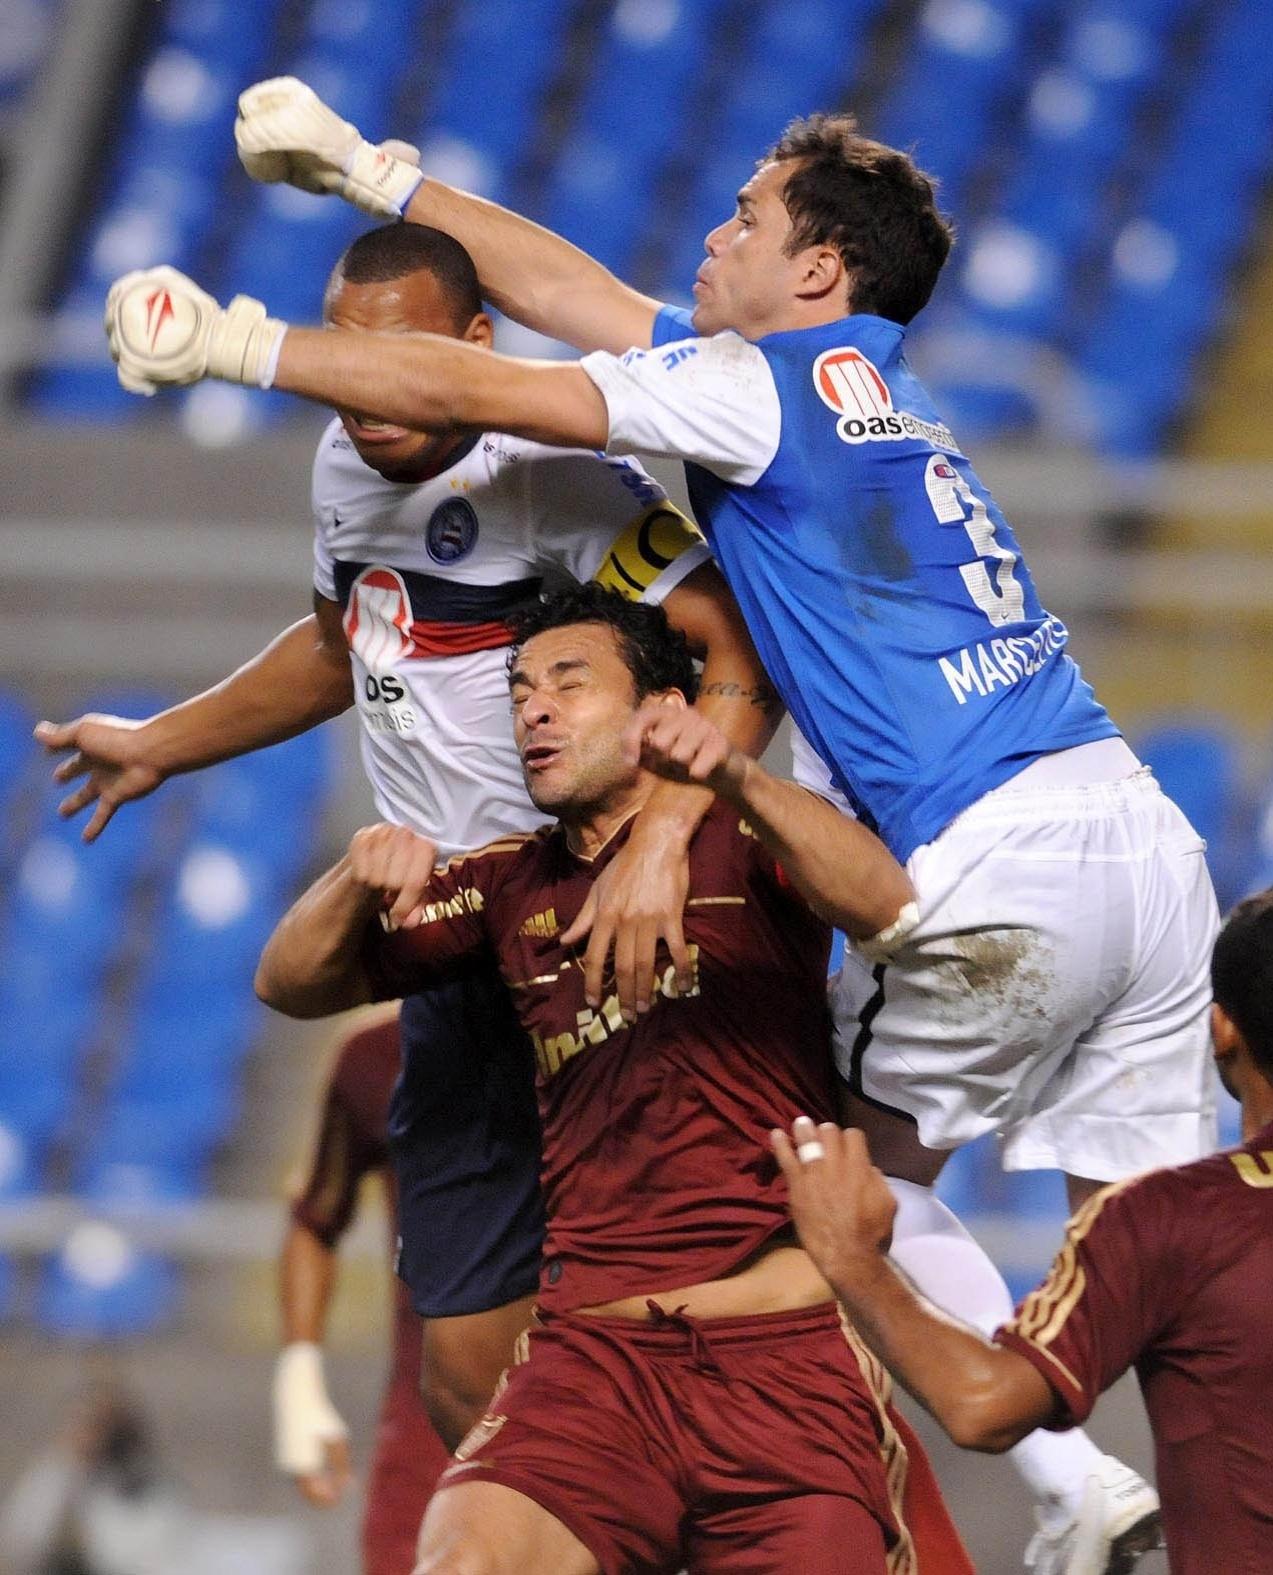 Goleiro Marcelo Lomba, do Bahia, sobe para evitar cabeceio de Fred, do Fluminense